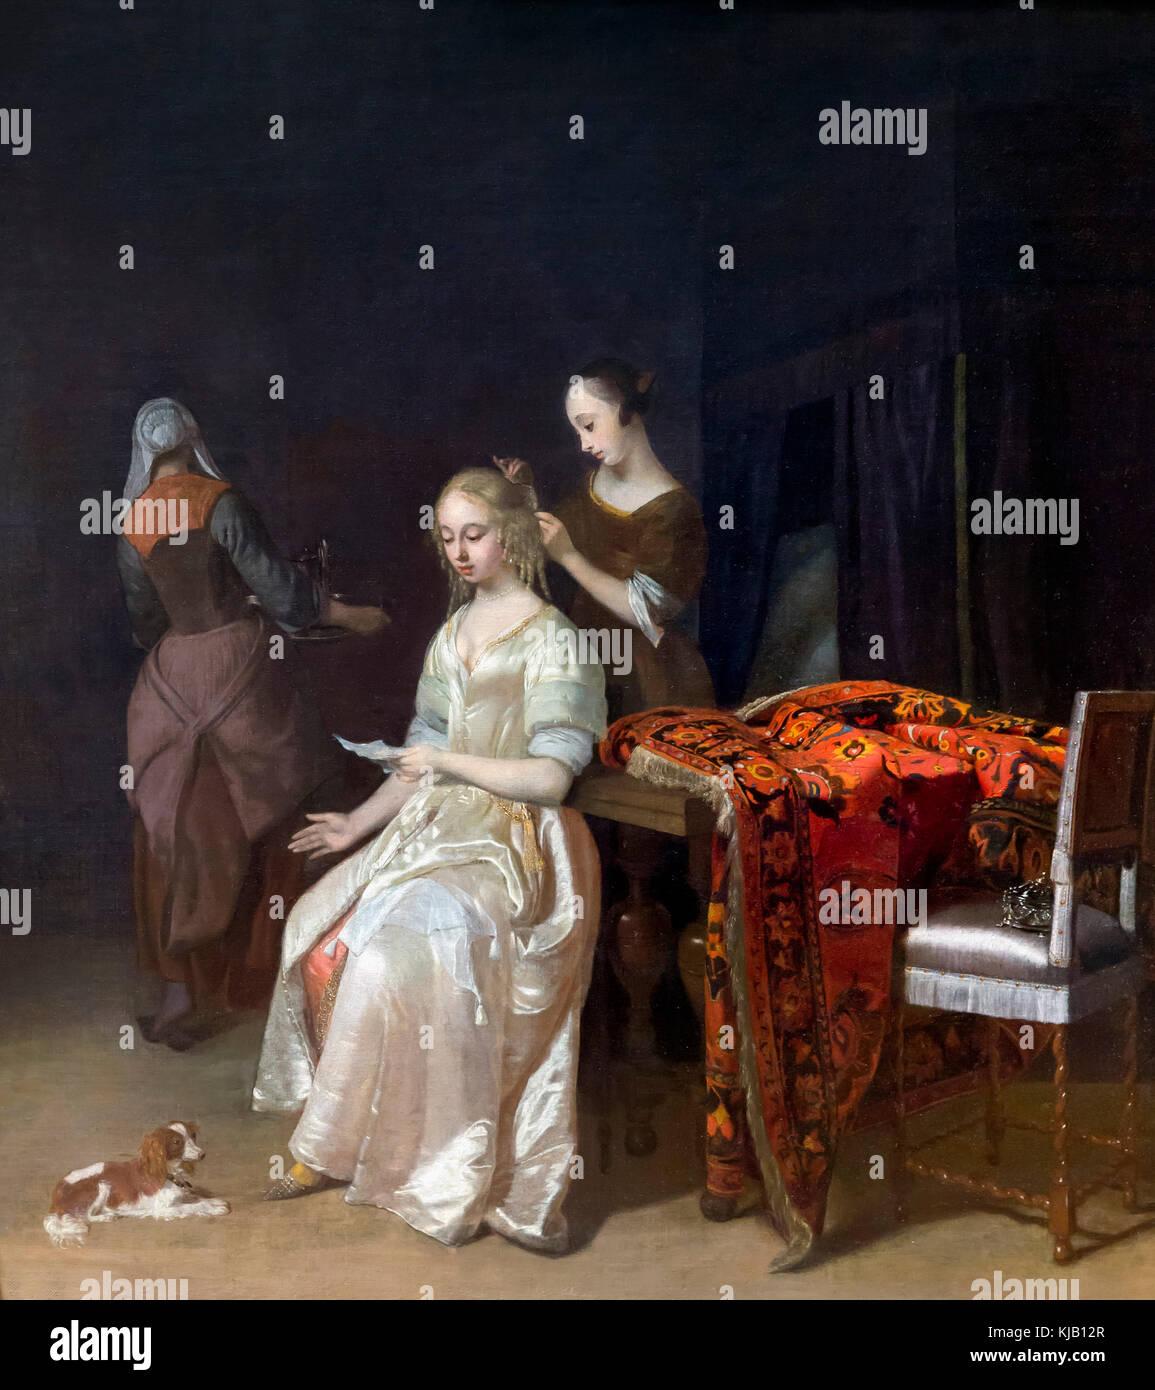 The Love Letter, Jacob Ochtervelt, 1670's, Metropolitan Museum of Art, Manhattan, New York City, USA, North - Stock Image